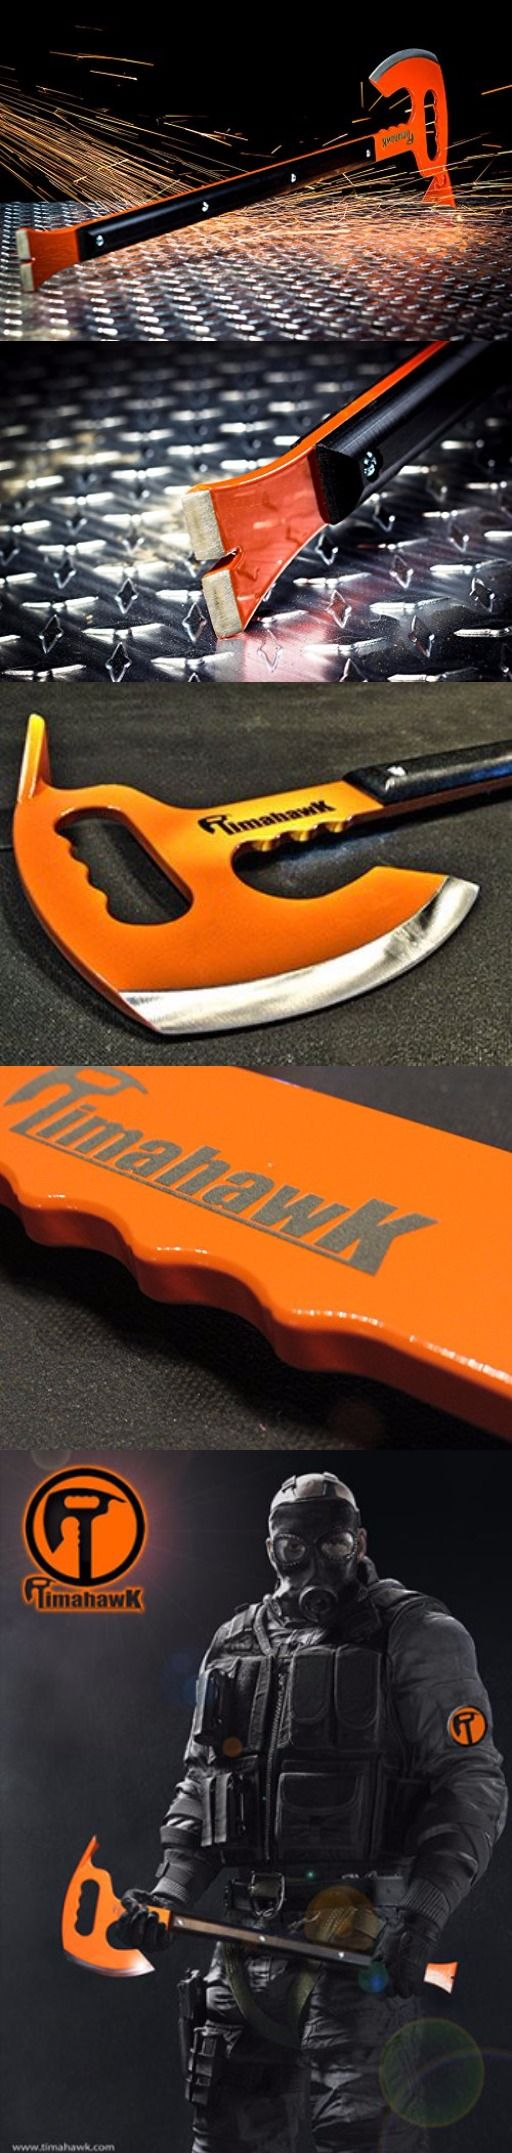 Timahawk Ultimate Survival Multi-Tool Timahawk Axe USA